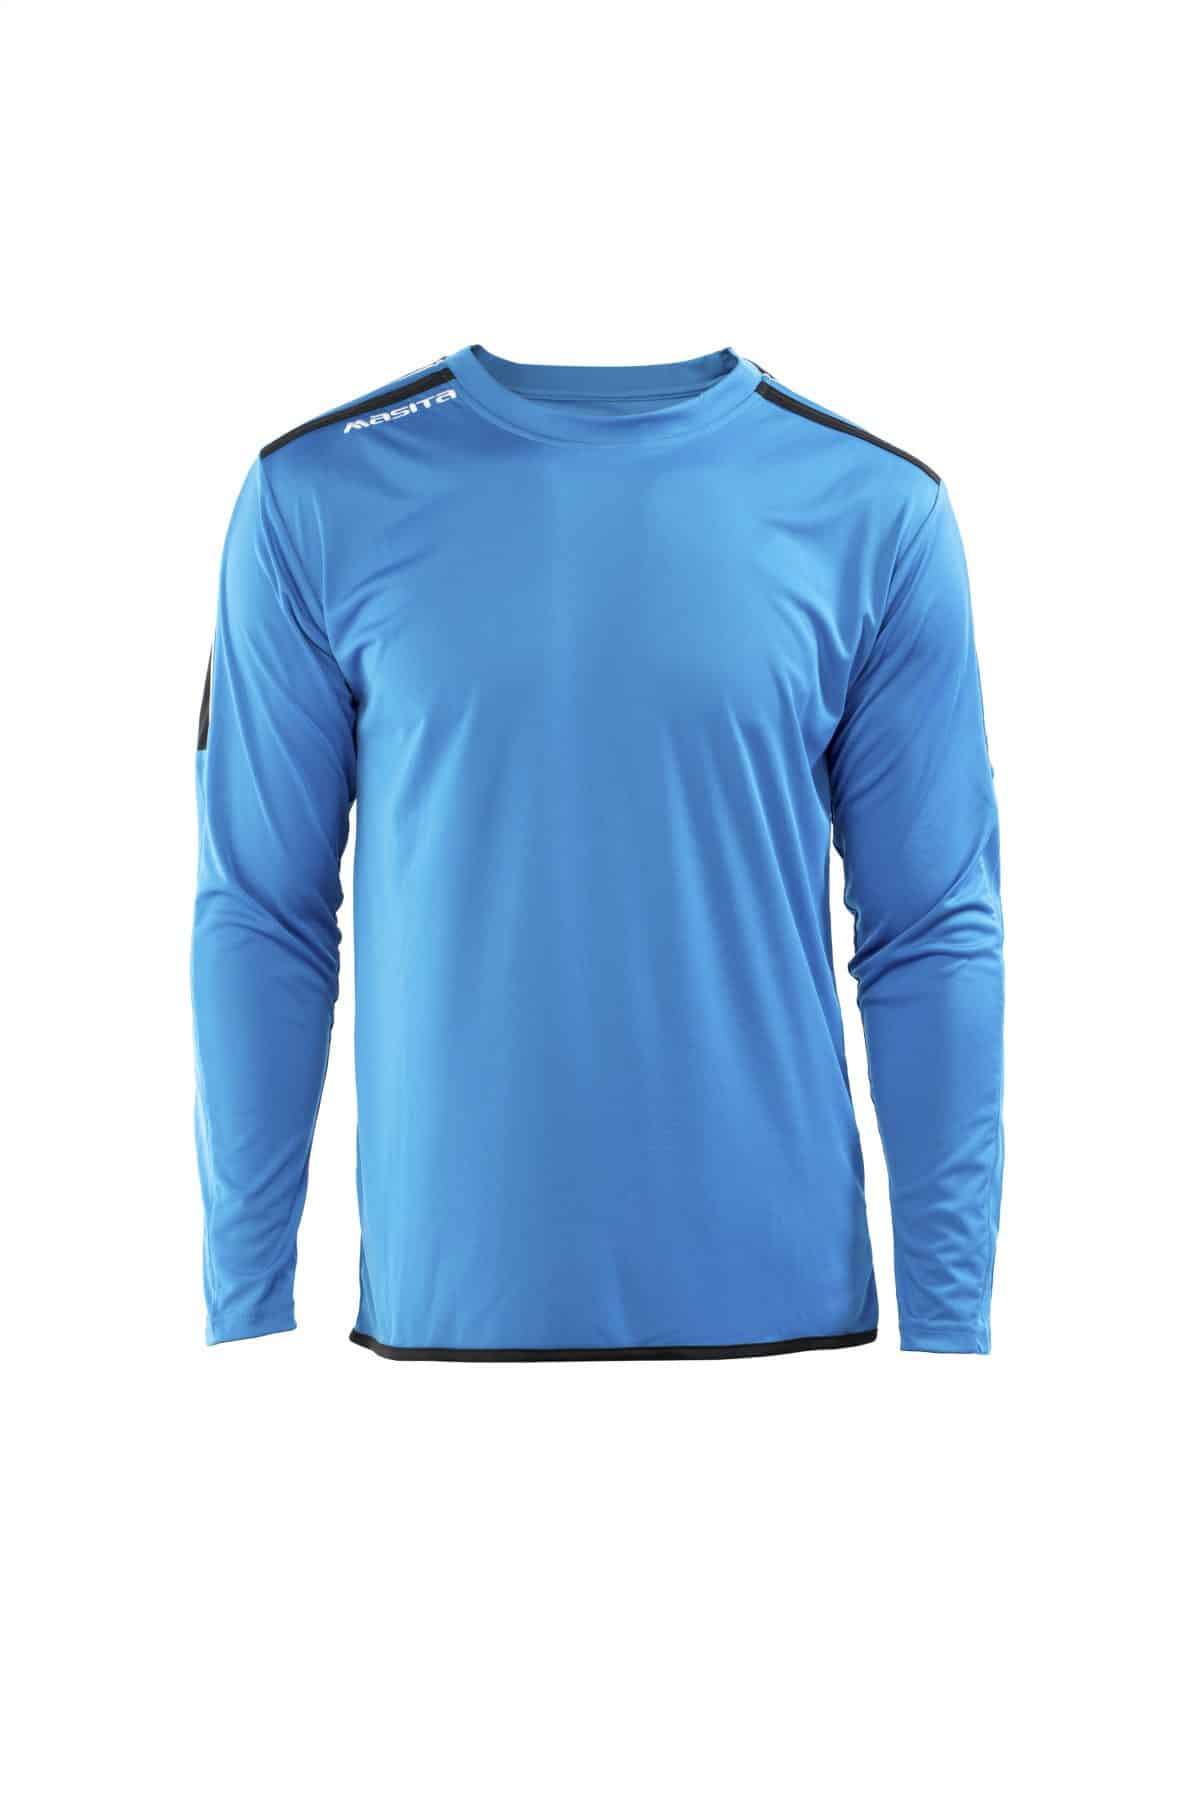 blauw-keepersshirt-masita-kopen